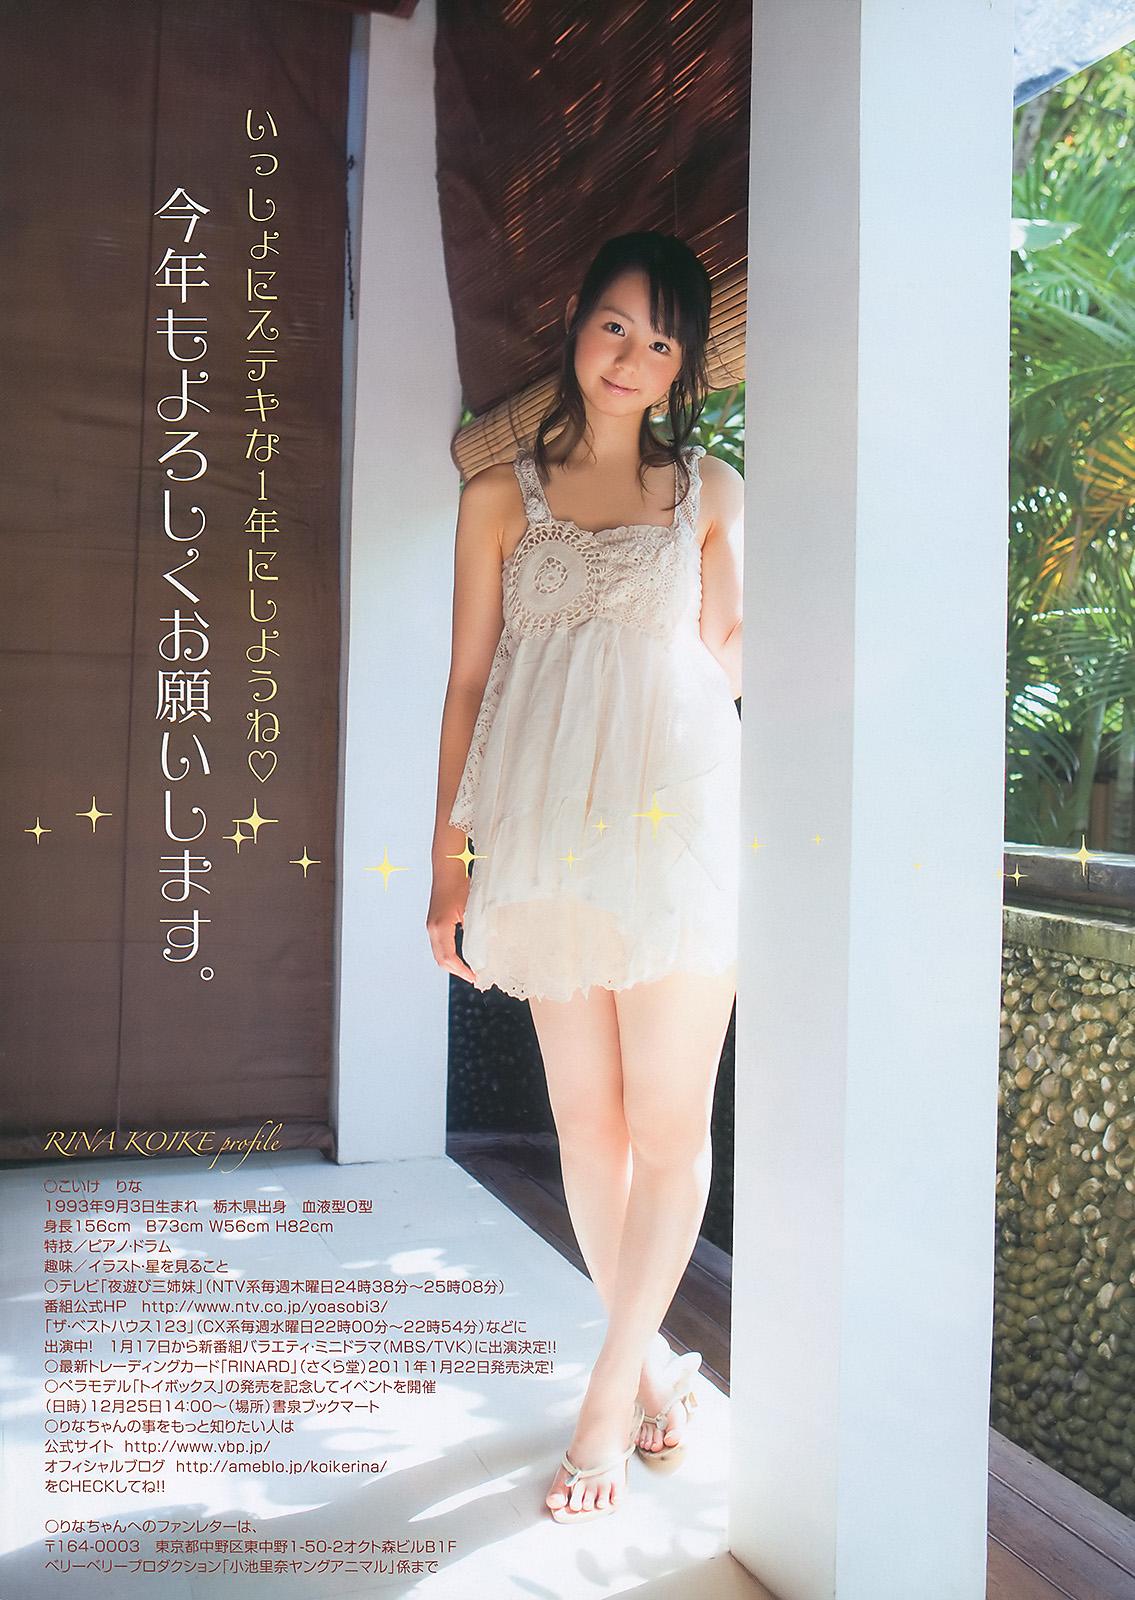 Photo Beauty Fashion And Girls Korean Actresses Model